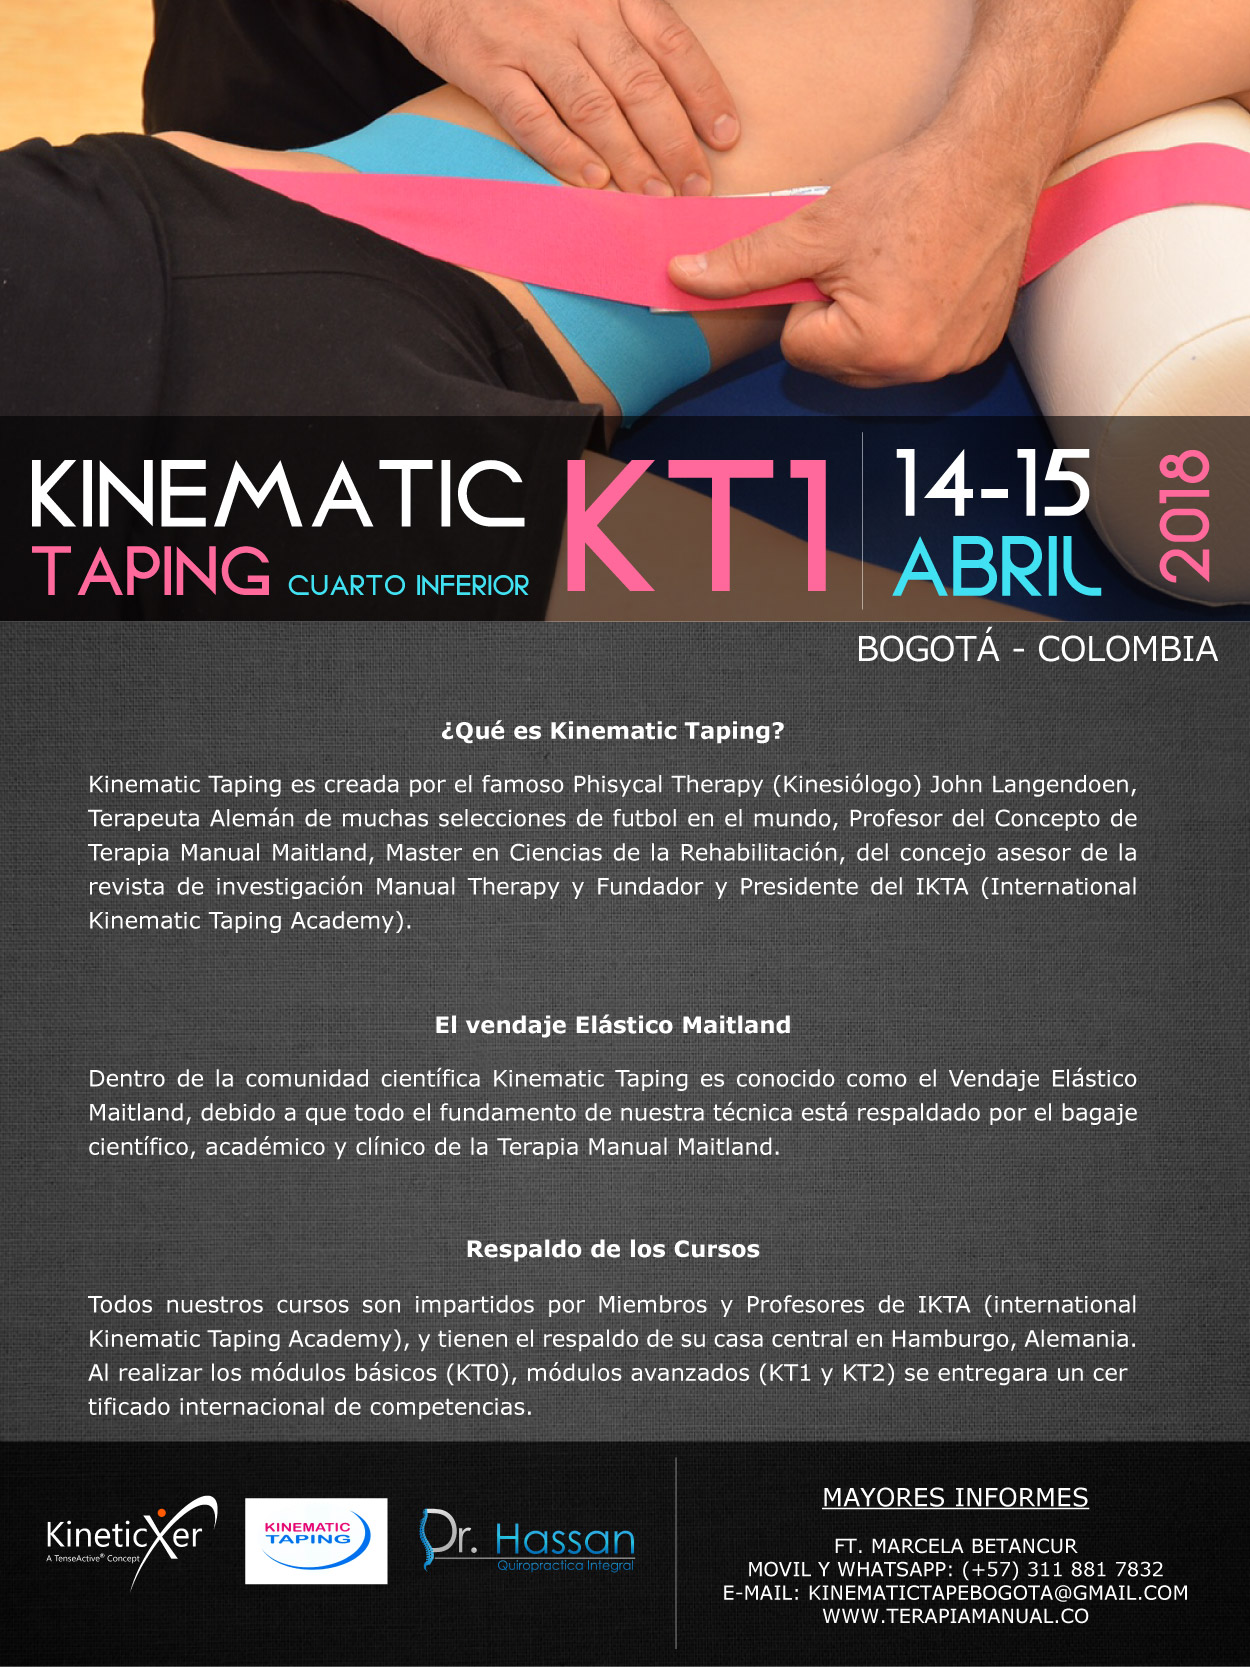 Kinematic Taping Kt1 - Bogotá Marzo 2018-023